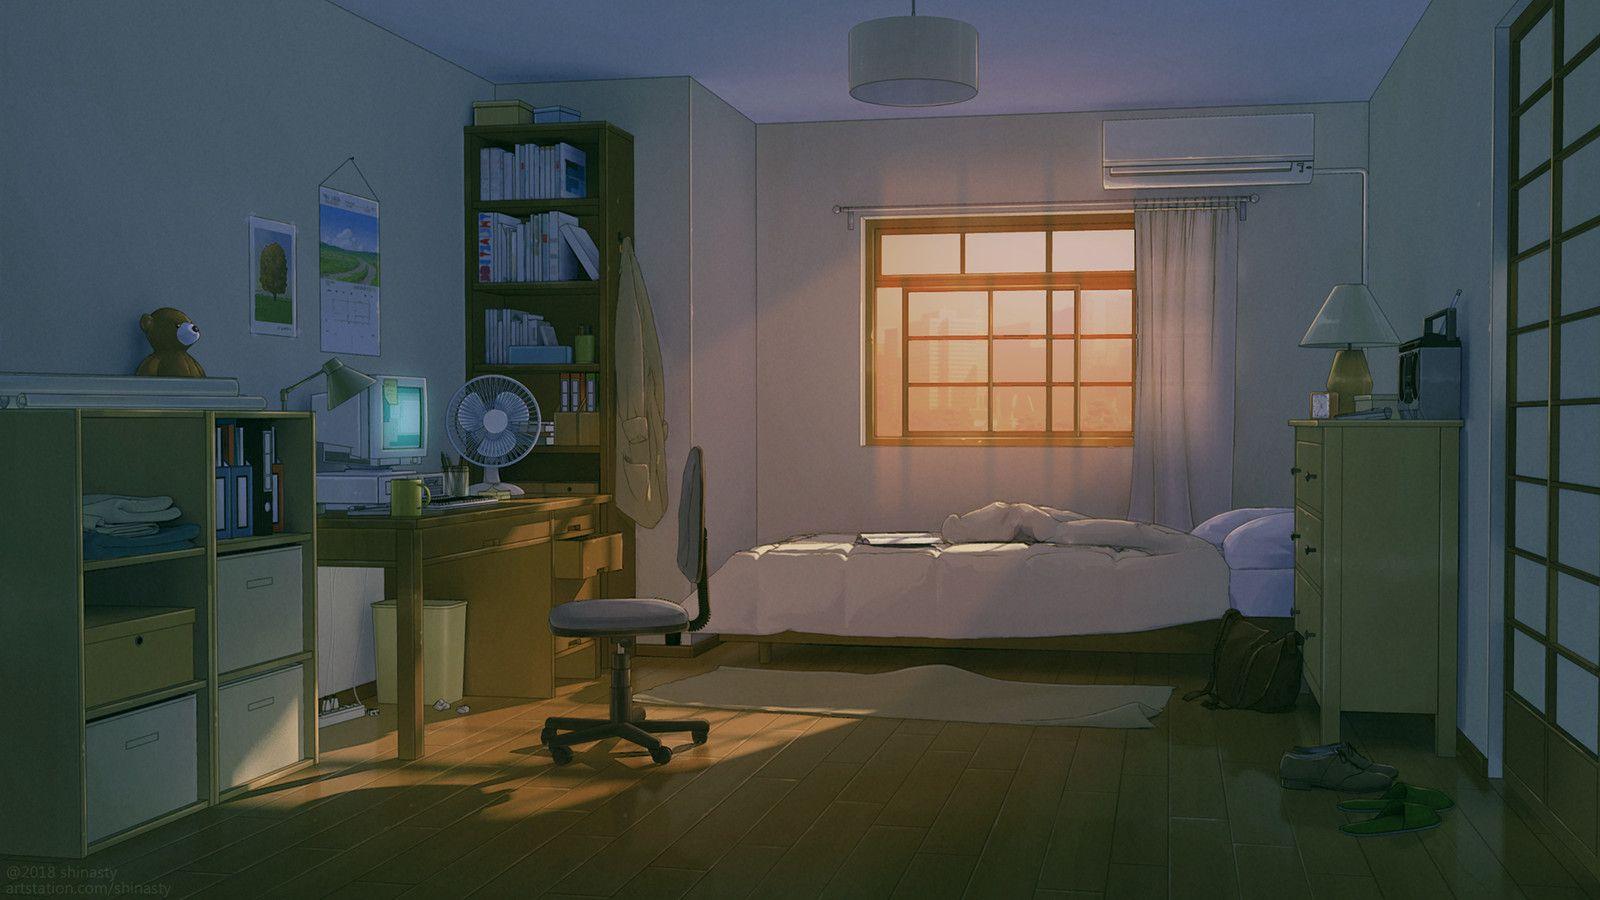 Pin by Ken Brown on Mood scenery in 2019 Bedroom drawing